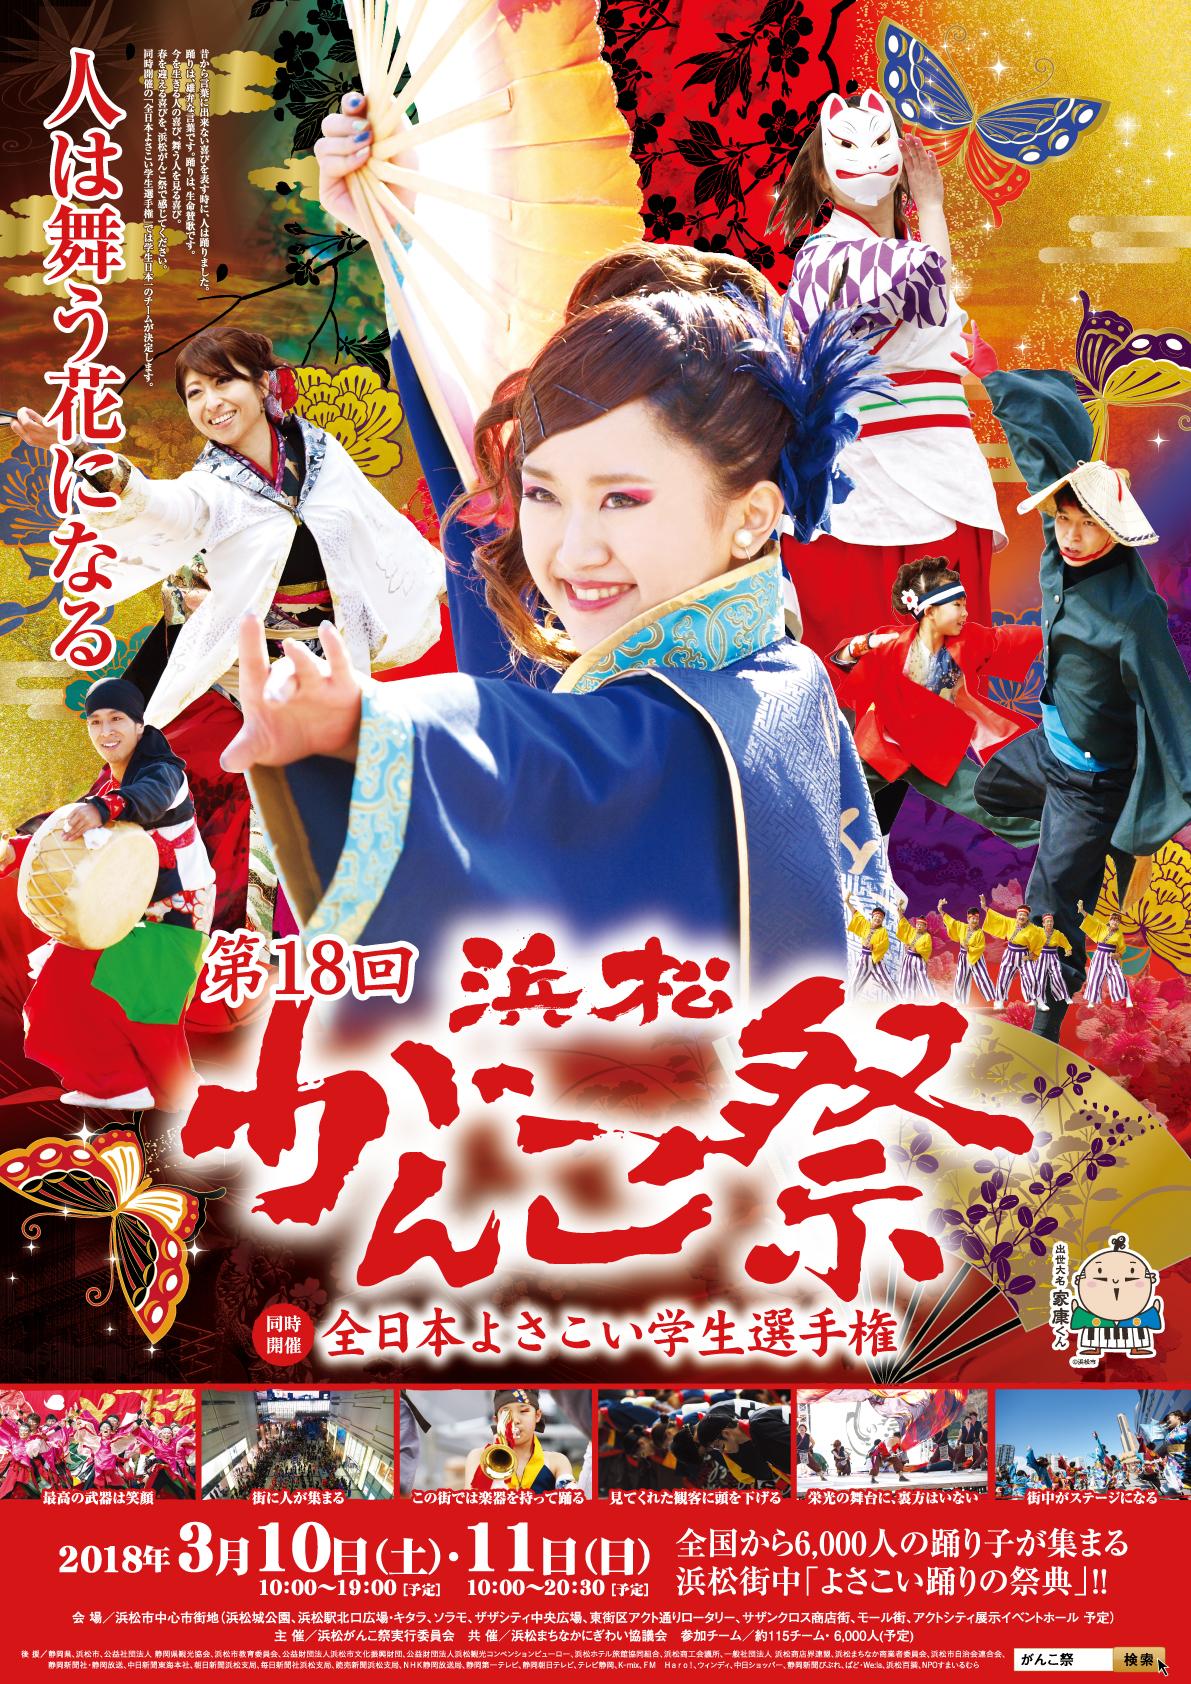 http://www.inhamamatsu.com/japanese/recommend/hgkm2018.jpg